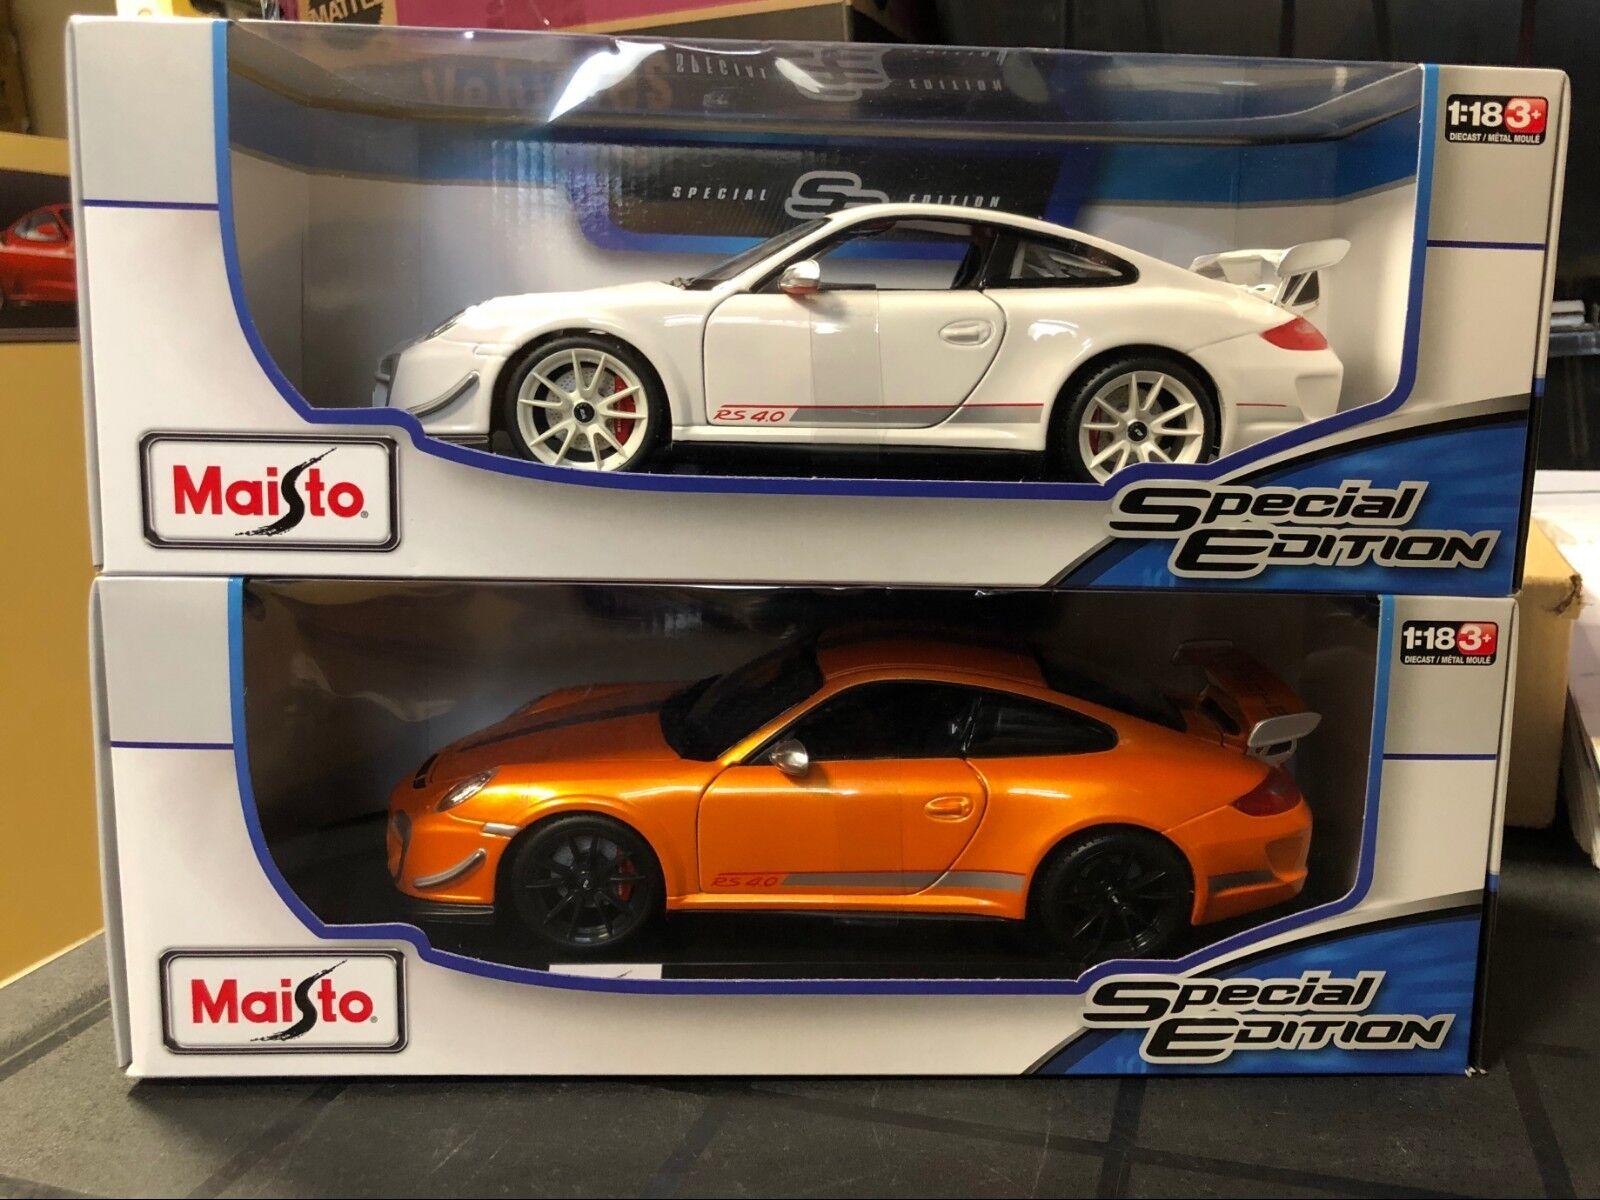 SET OF 2 PORSCHE 911 GT3 RS 4.0 1 orange & 1 WHITE BY MAISTO 1 18  FREE SHIPPING